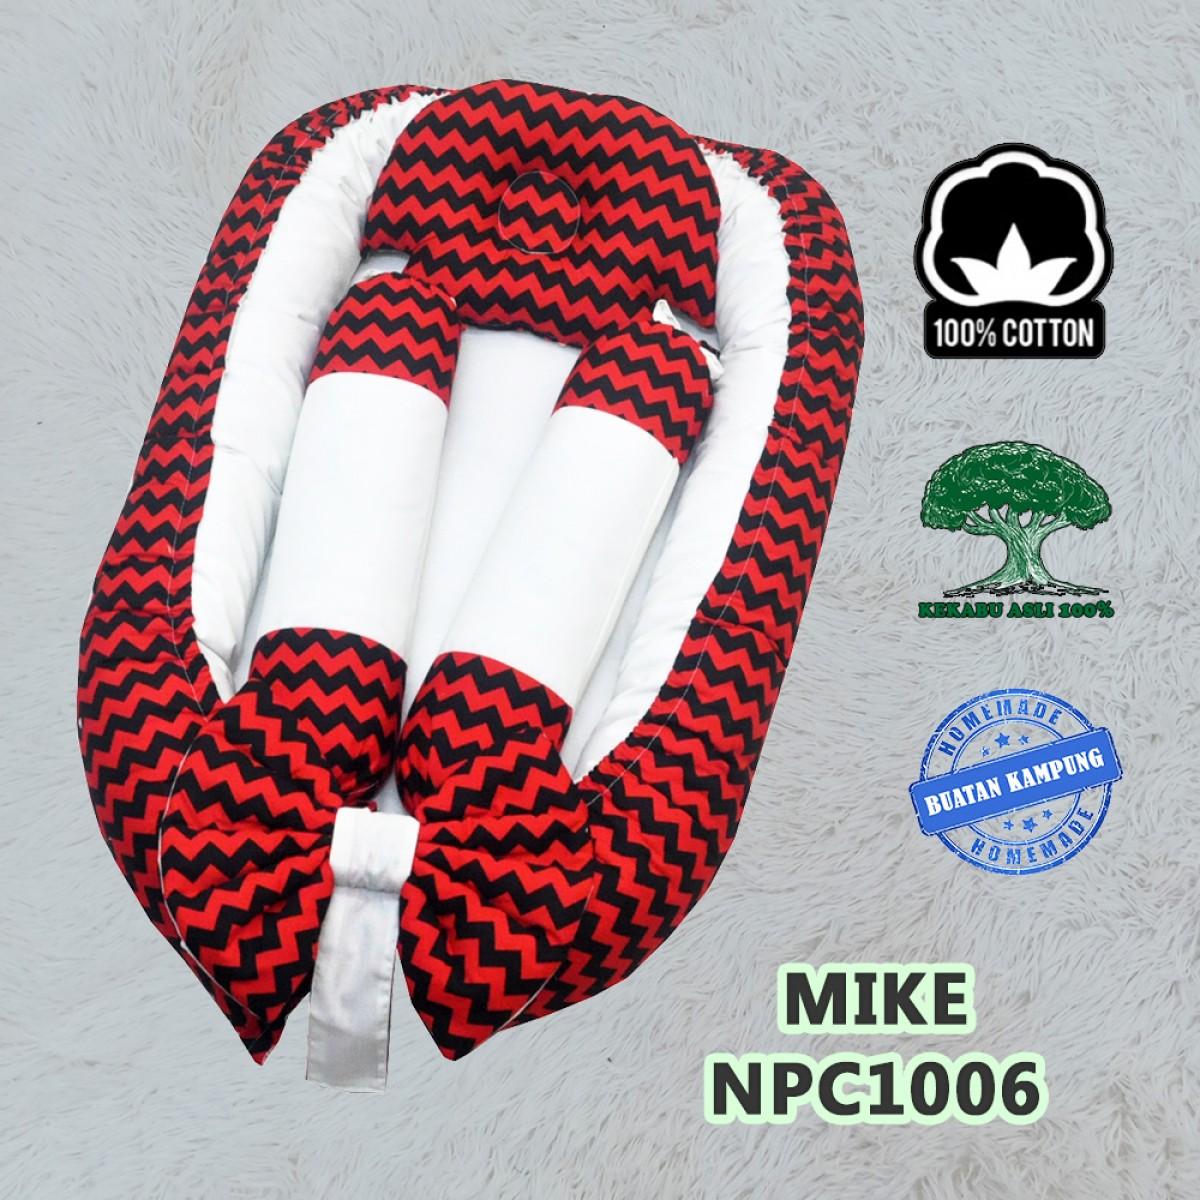 Mike - Kico Baby Center